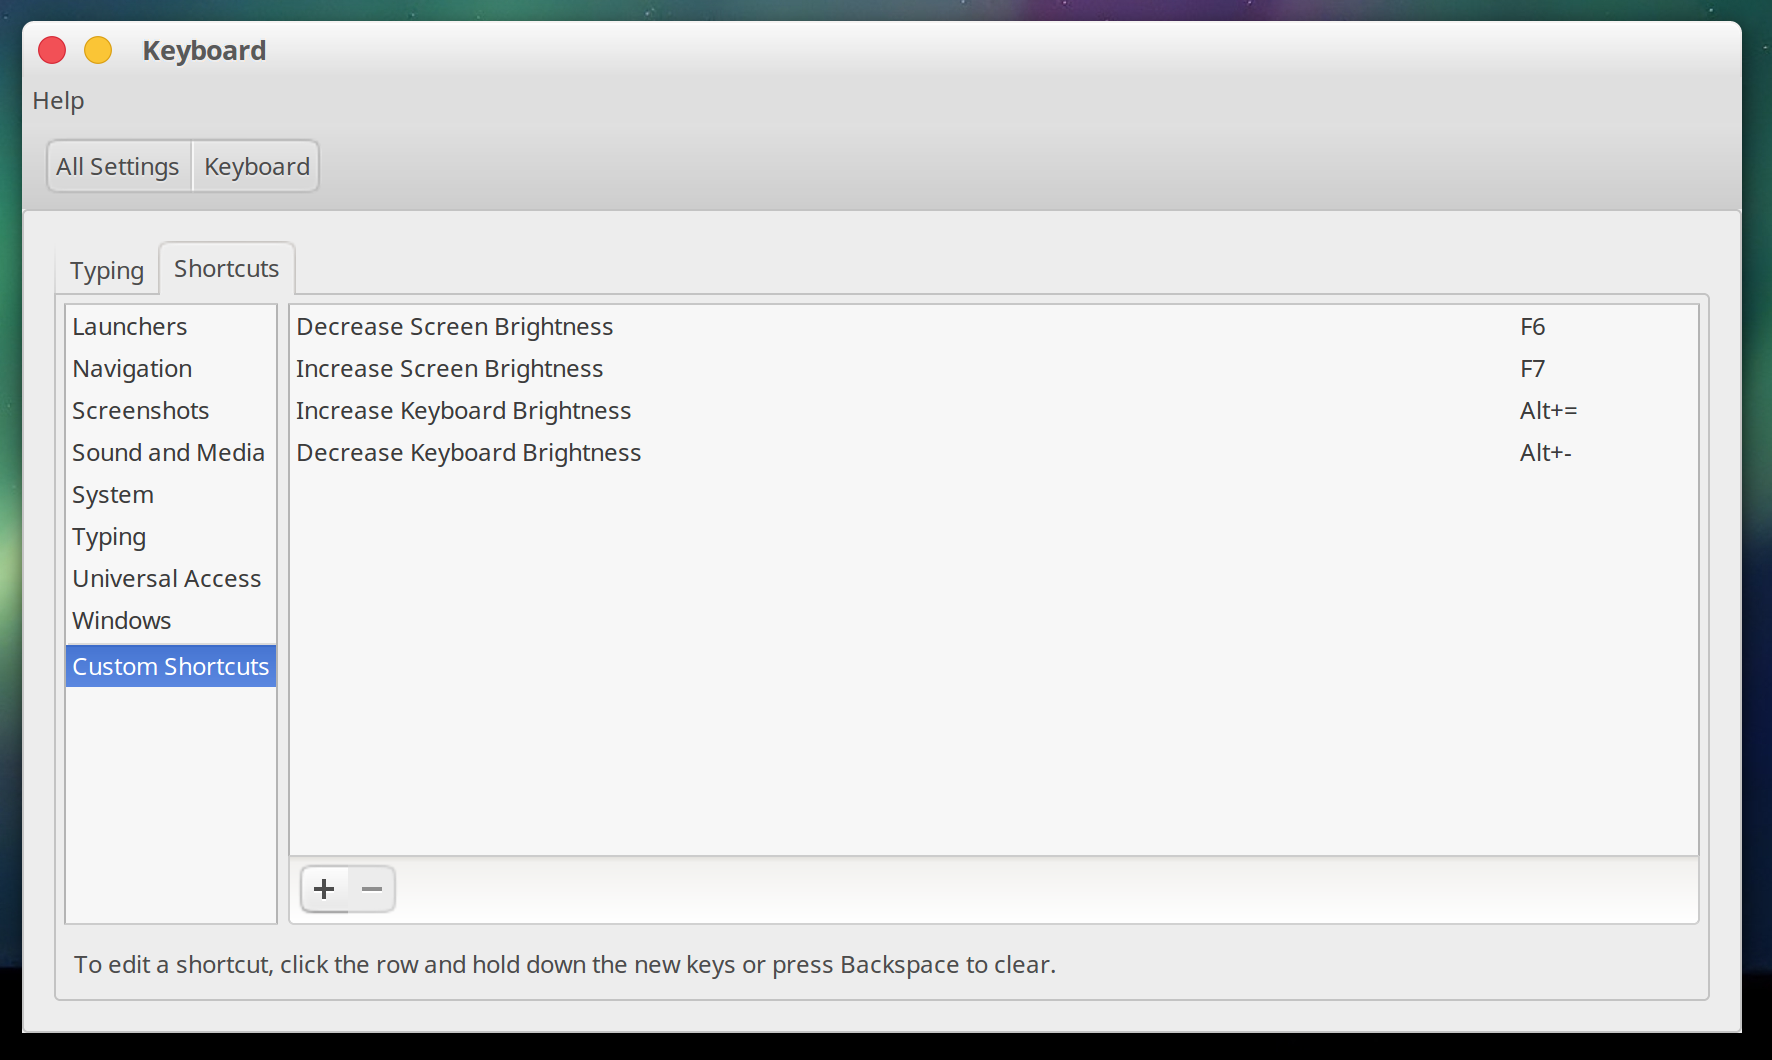 Ubuntu Keyboard settings dialog showing brightness shortcuts